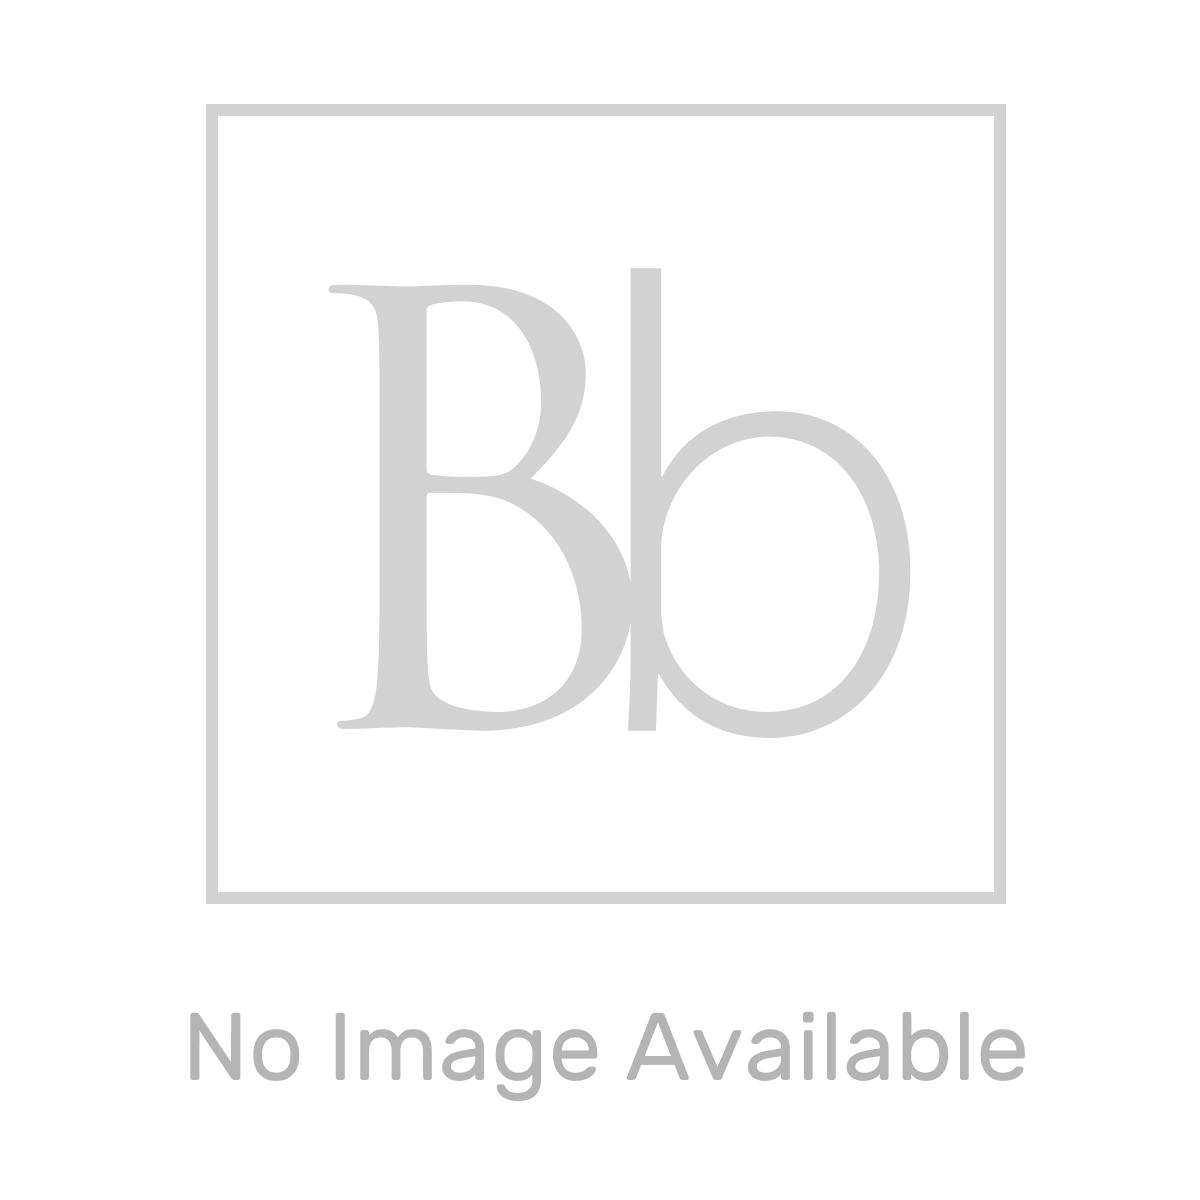 RAK Surface Cool Grey Matt Tile 1350 x 3050mm Lifestyle